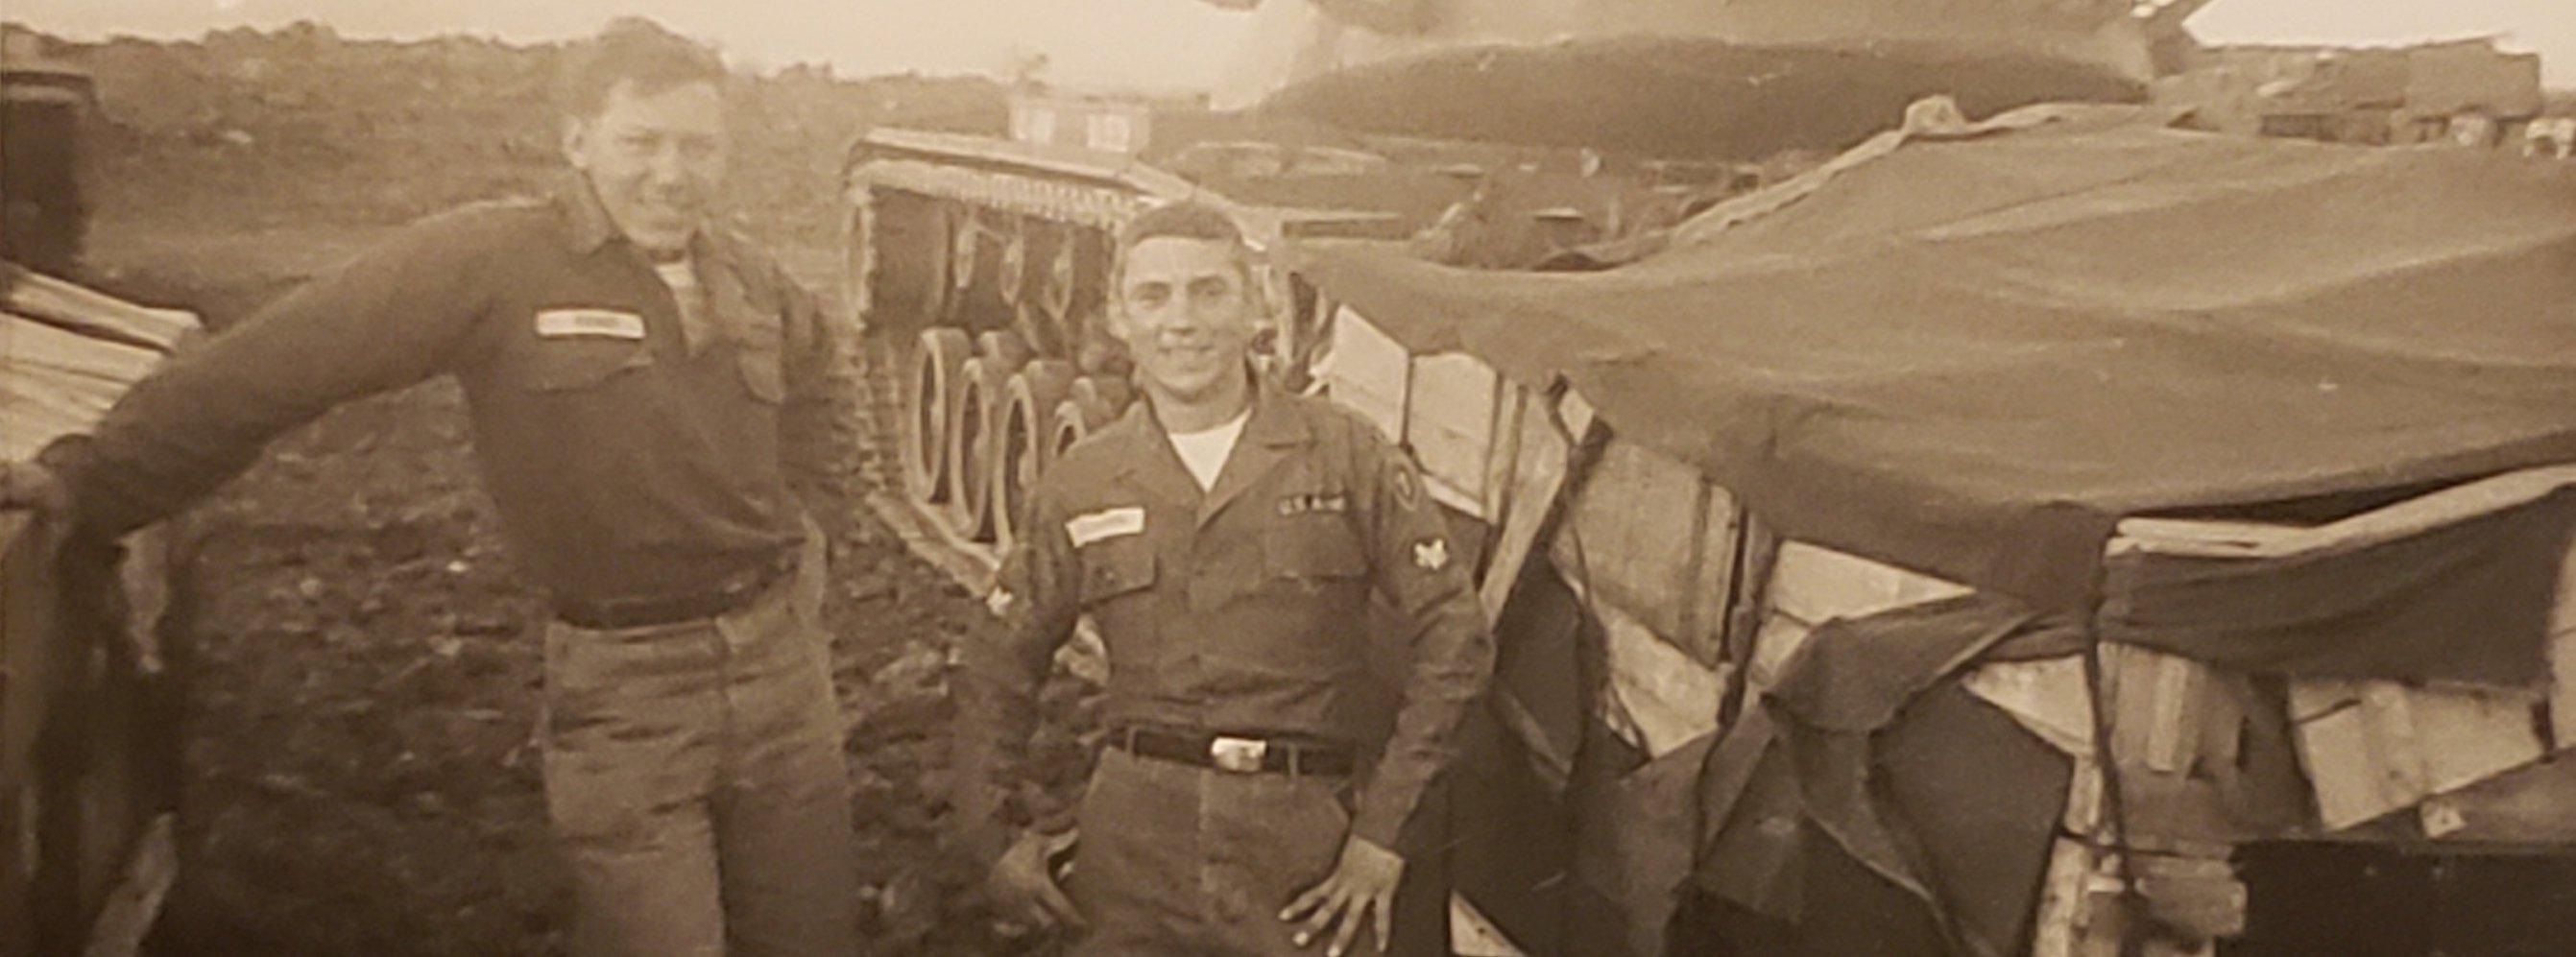 Flags of Valor - Portraits of Valor - Jack Cornn, U.S. Army Master Sergeant